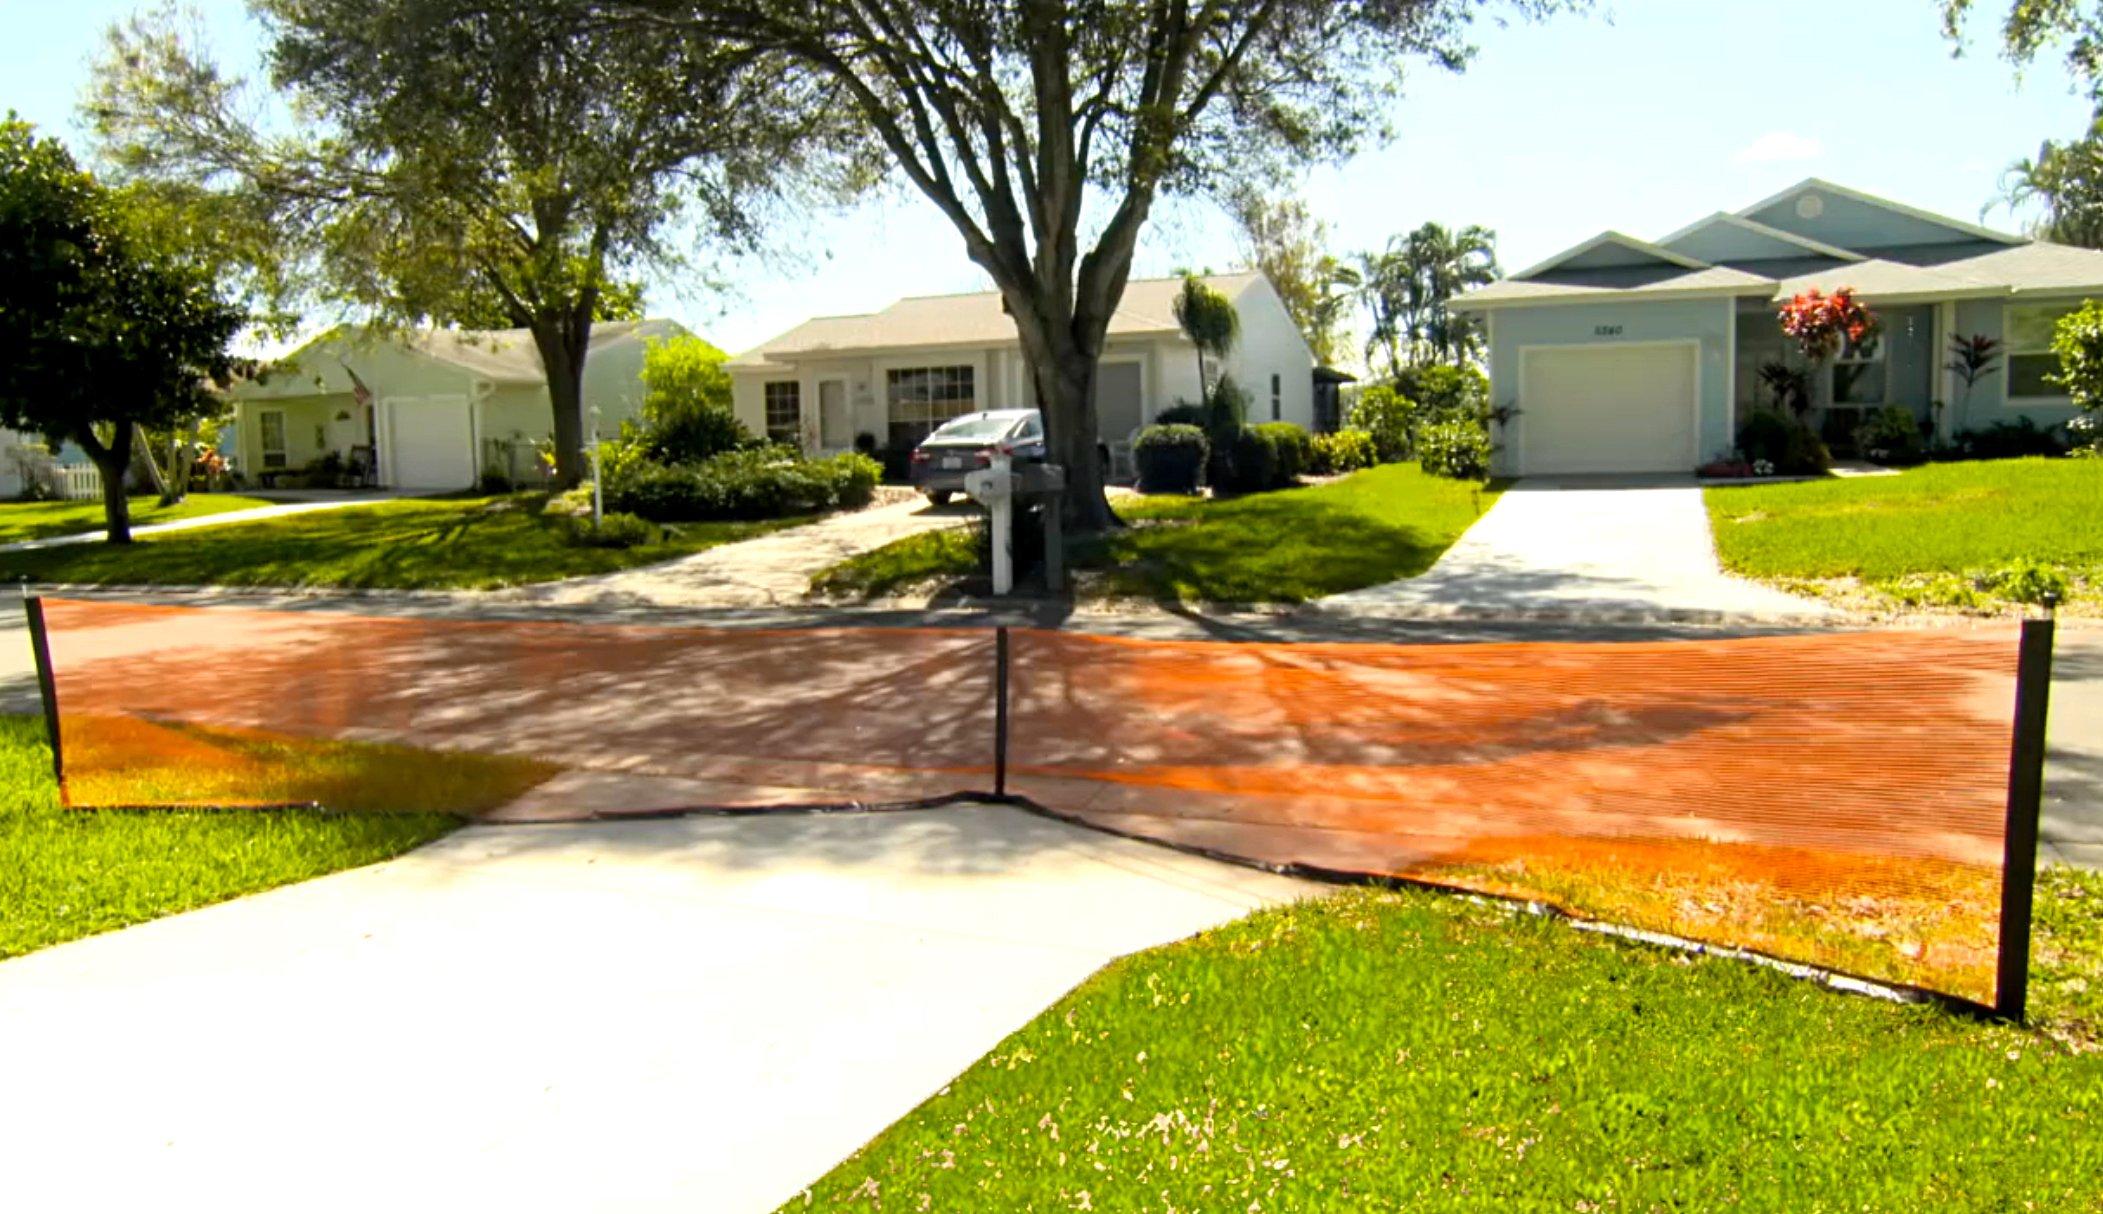 Play It Safe RPDN26 Driveway Net, Large, Orange by Play It Safe (Image #3)